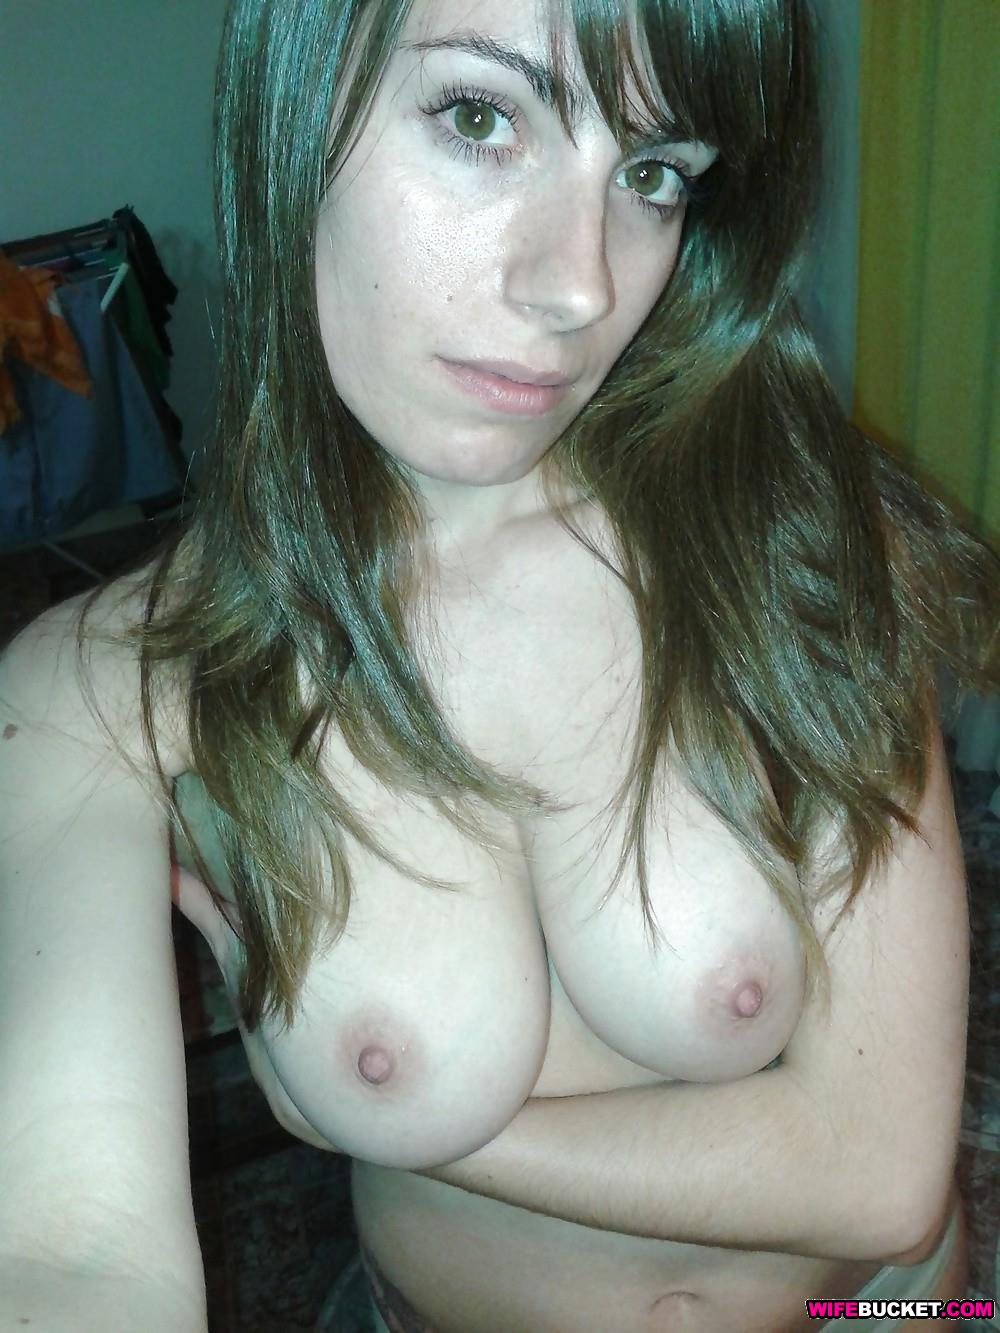 Amature bored wife homepage nude agree